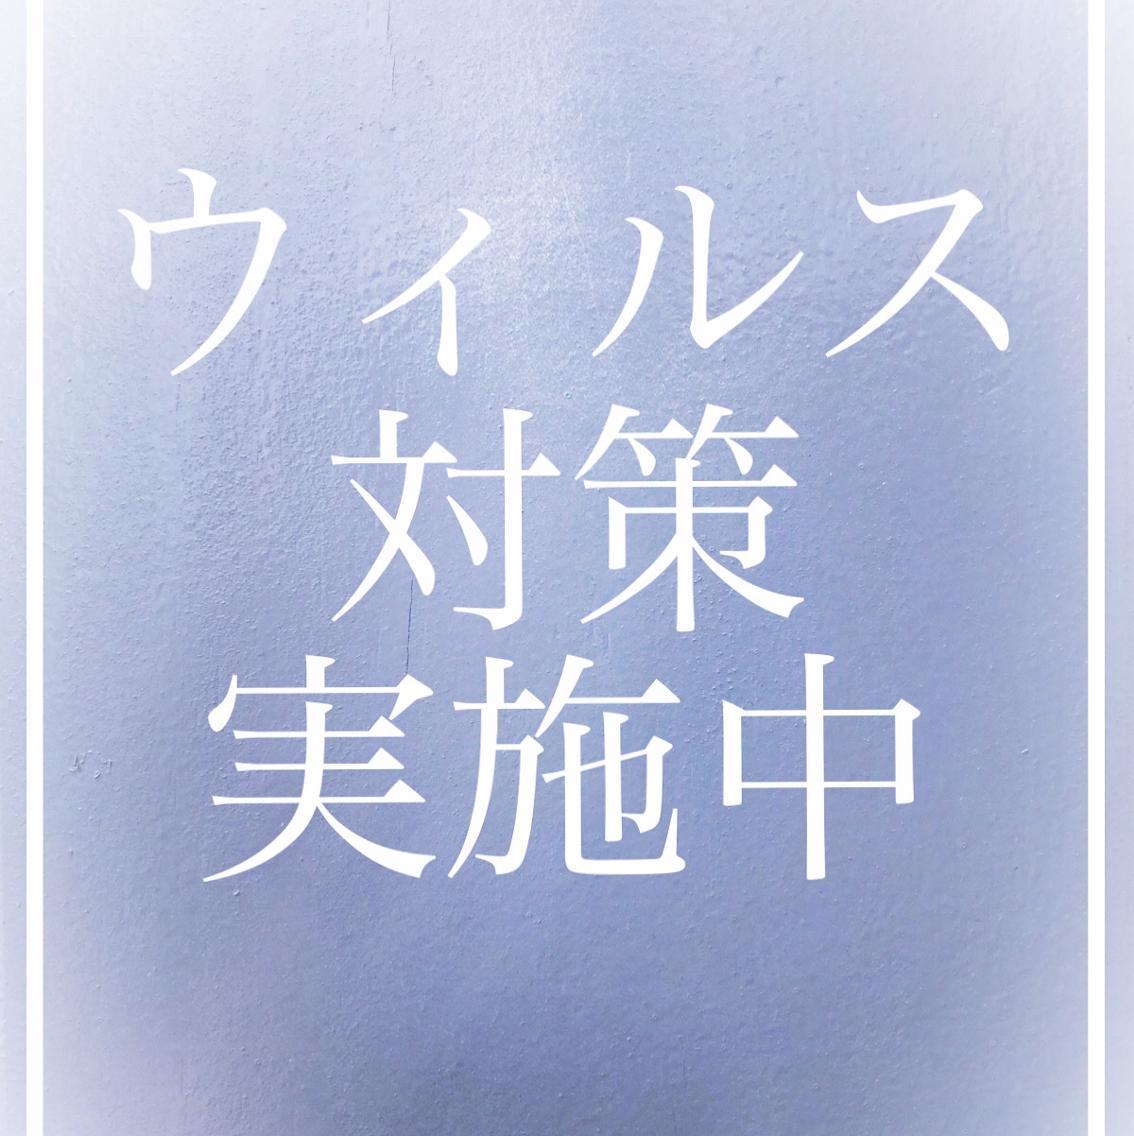 Beauty Salon peige所属・斉藤 よういちの掲載